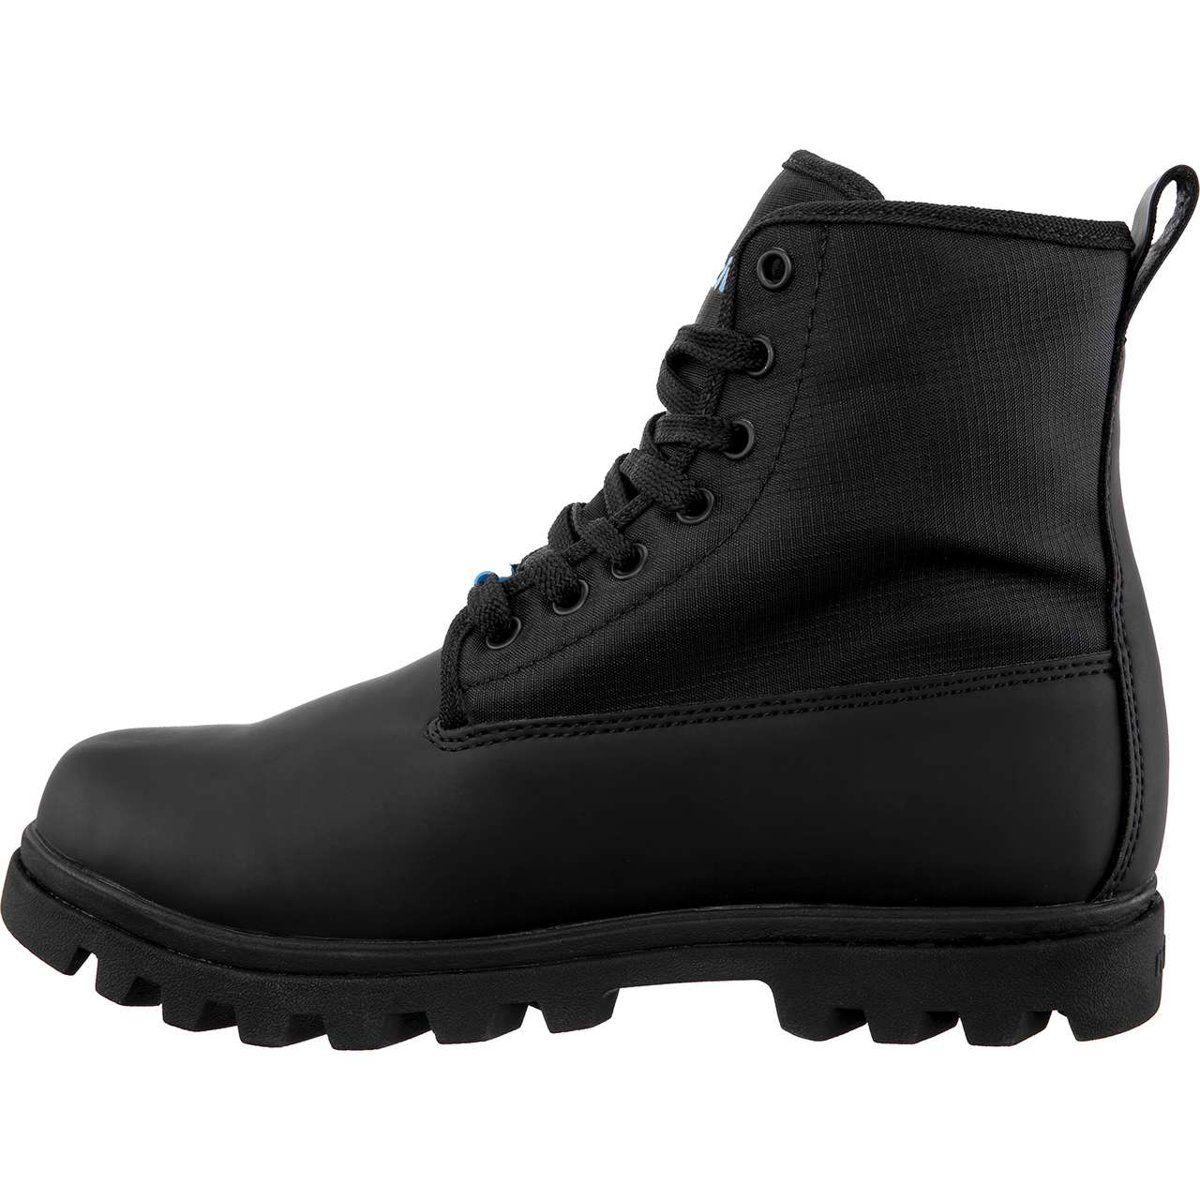 Trekkingowe Damskie Native Native Czarne Johnny Treklite Jiffy Black Jiffy Black Boots Hiking Boots Black Sneaker